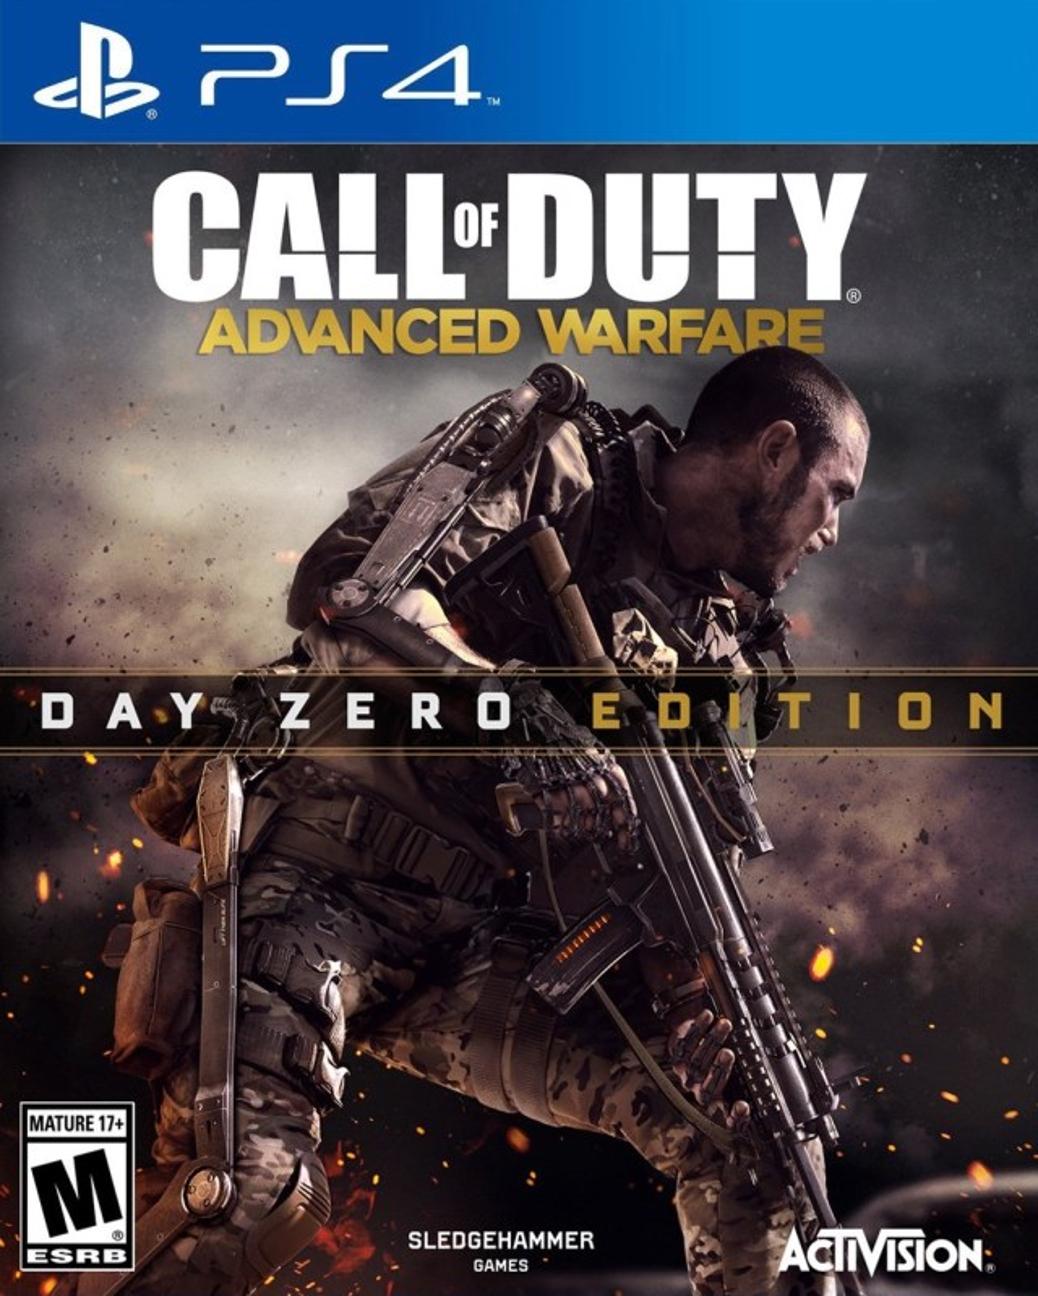 Call of Duty Advanced Warfare - PlayStation 4 - North American Box Art